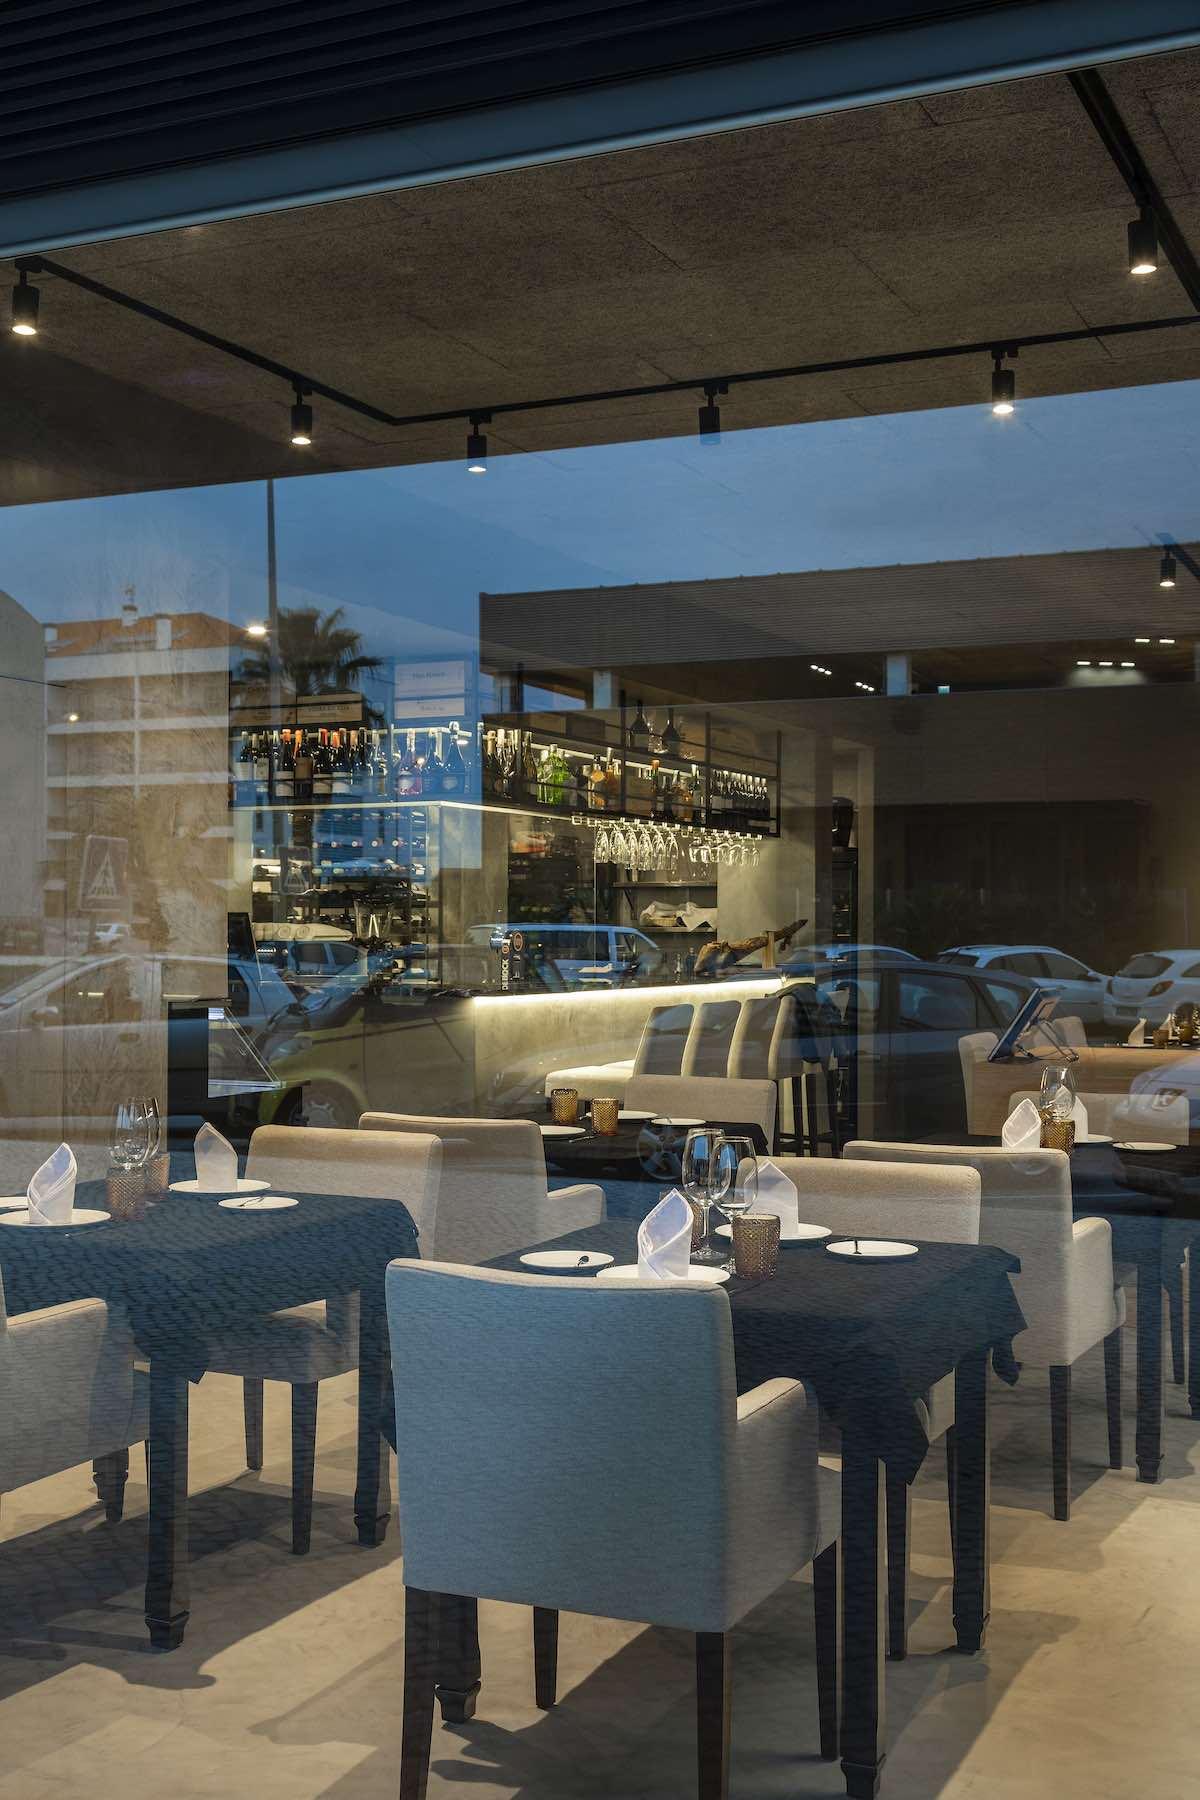 FAMA_Restaurant_Paulo_Martins_Arquitectura_and_design_AmazingArchitecture_%20012.jpg